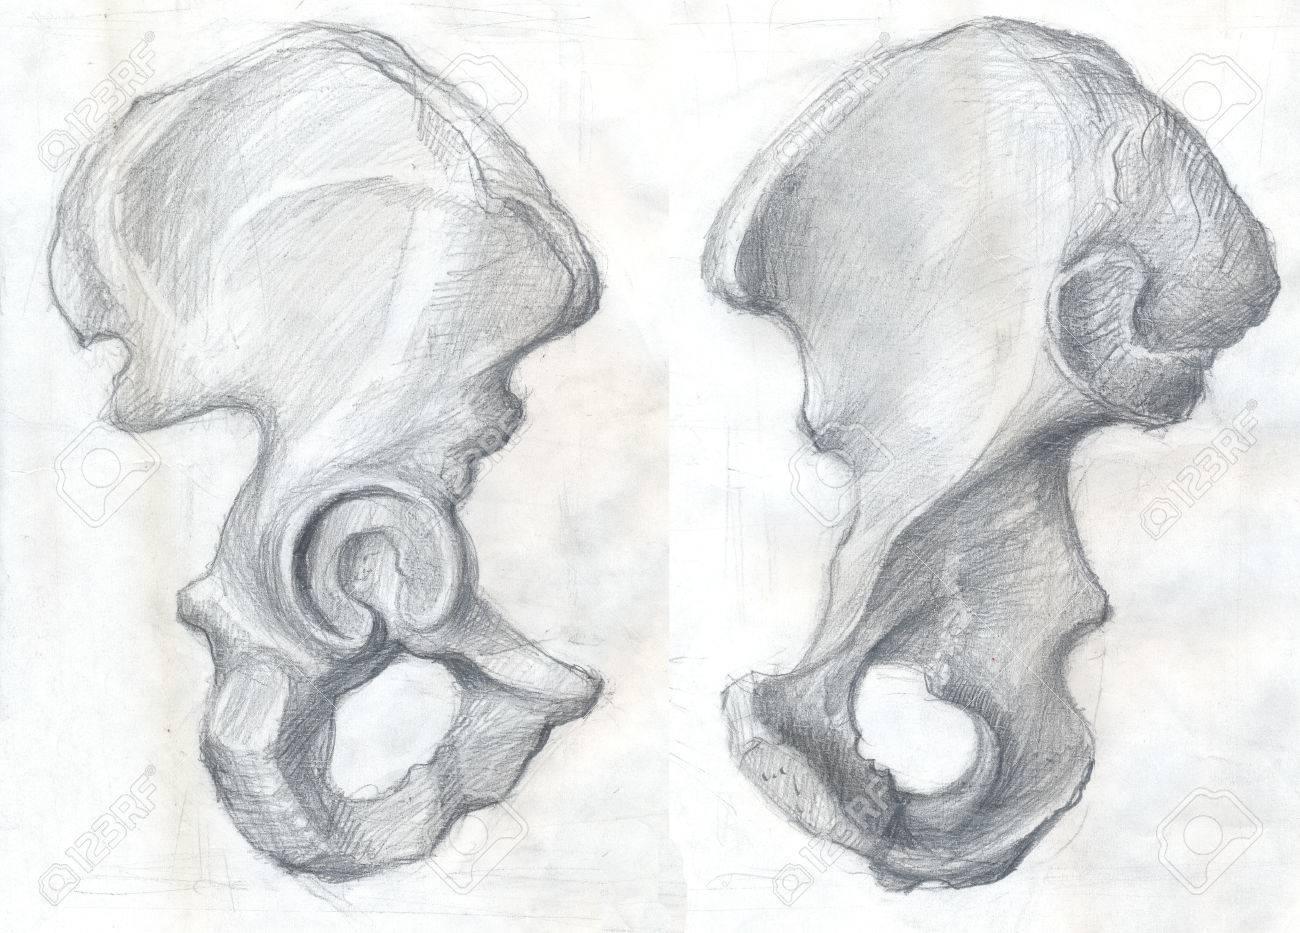 Hand Drawn Illustrations Of The Hip Bone Original Artistic Pencil